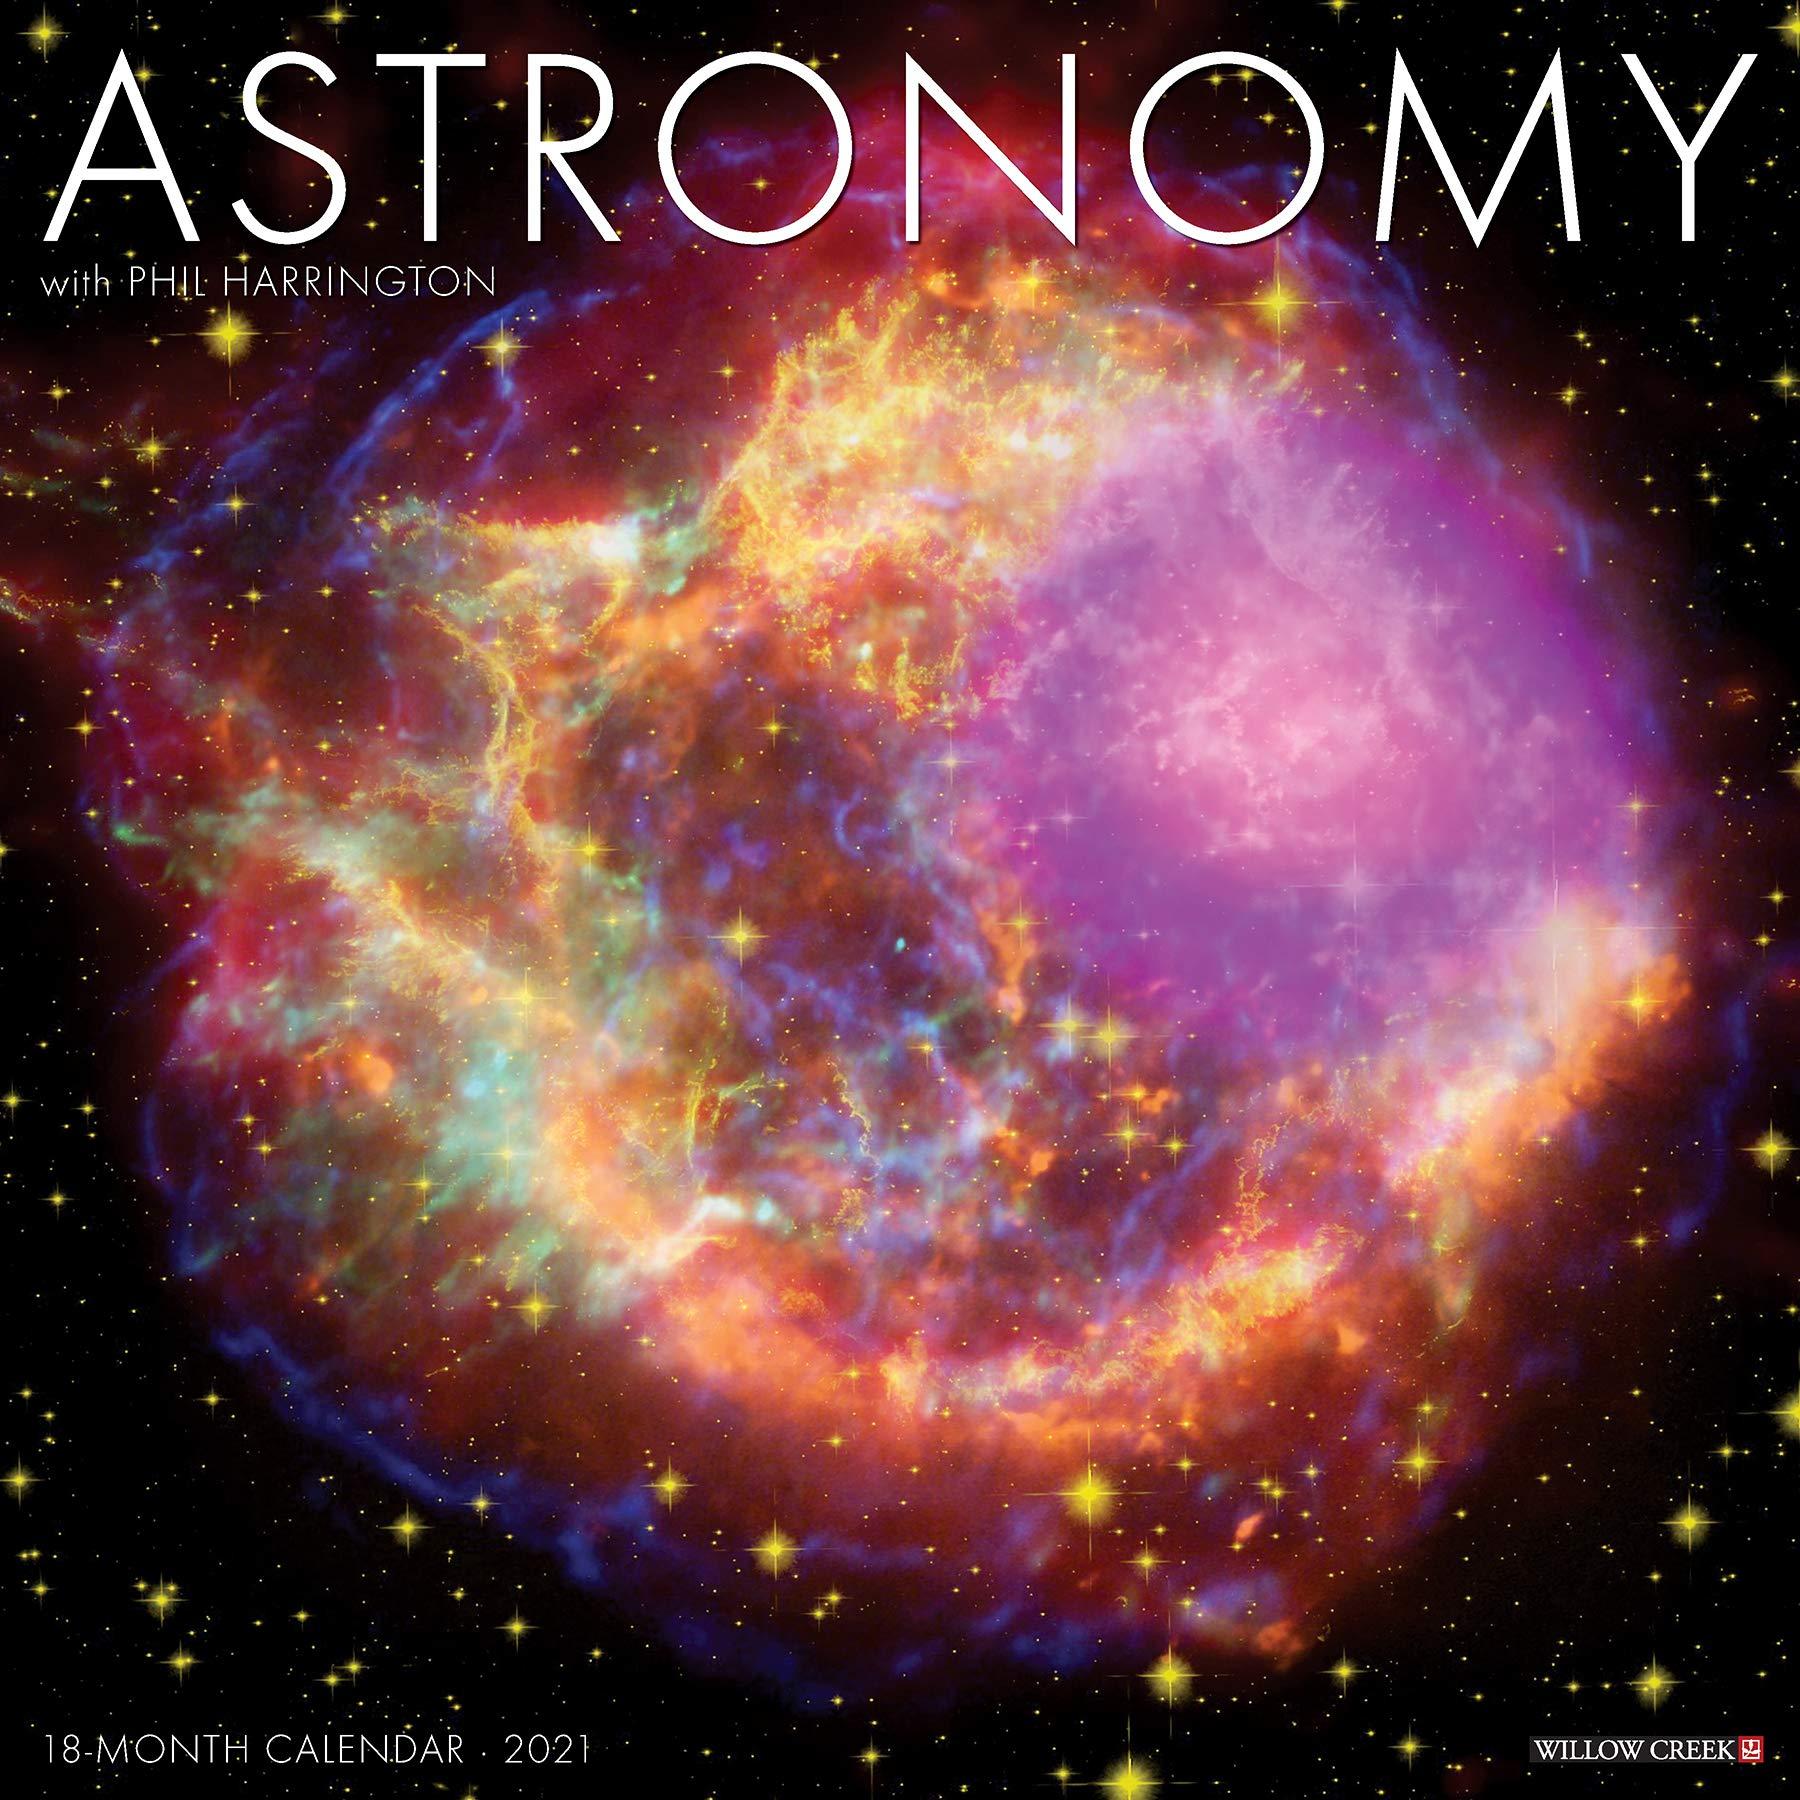 Astronomy 2021 Wall Calendar: Willow Creek Press: 0709786054930